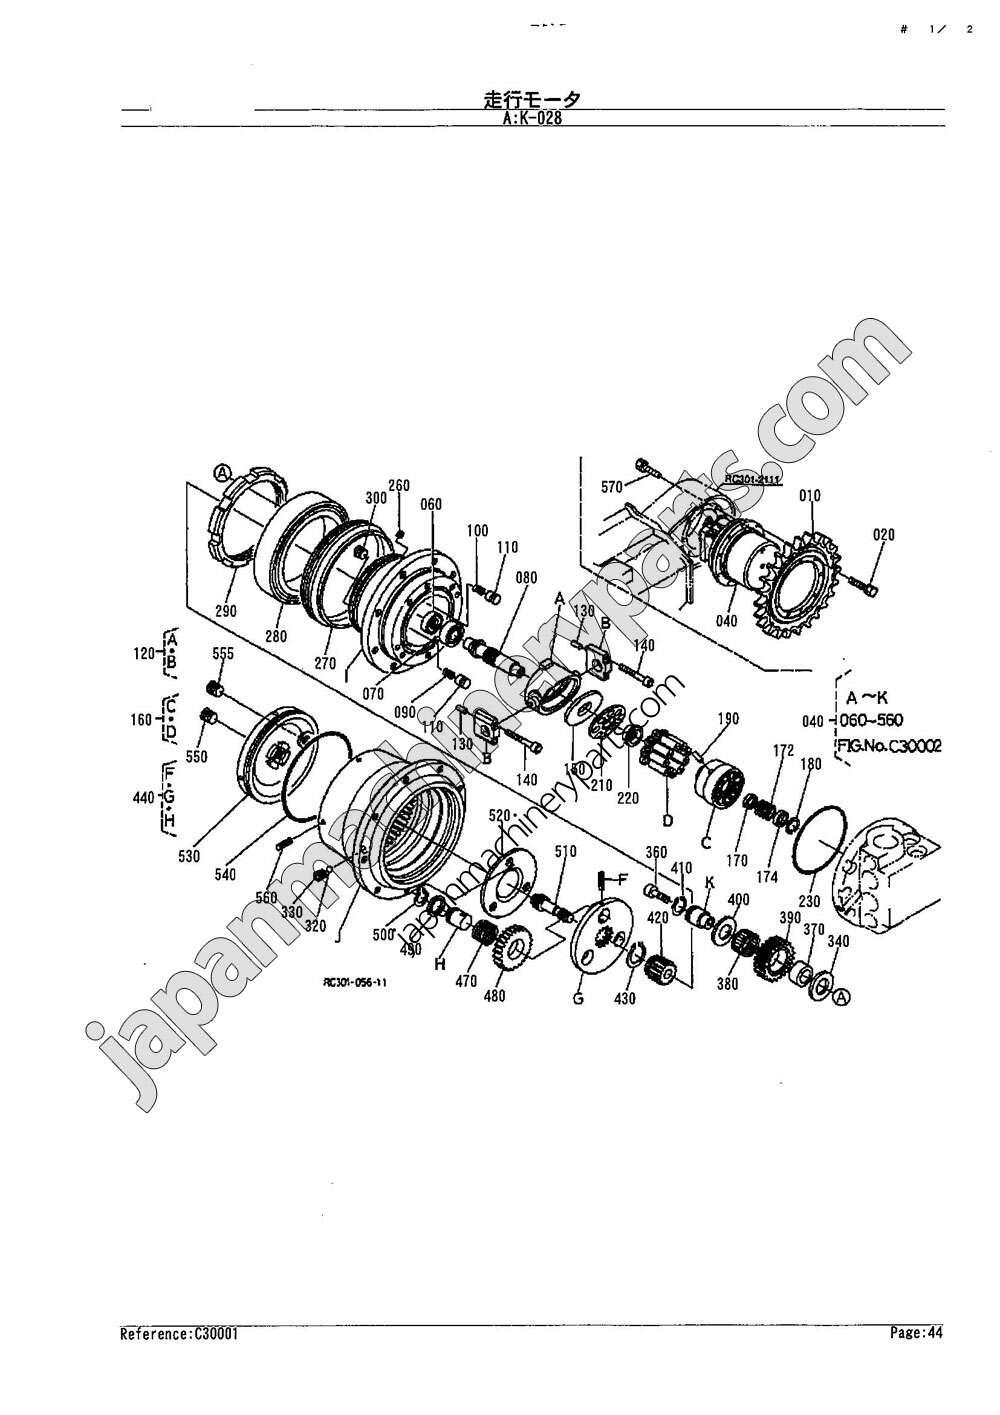 kubota front axle parts diagram  u2022 wiring and engine diagram